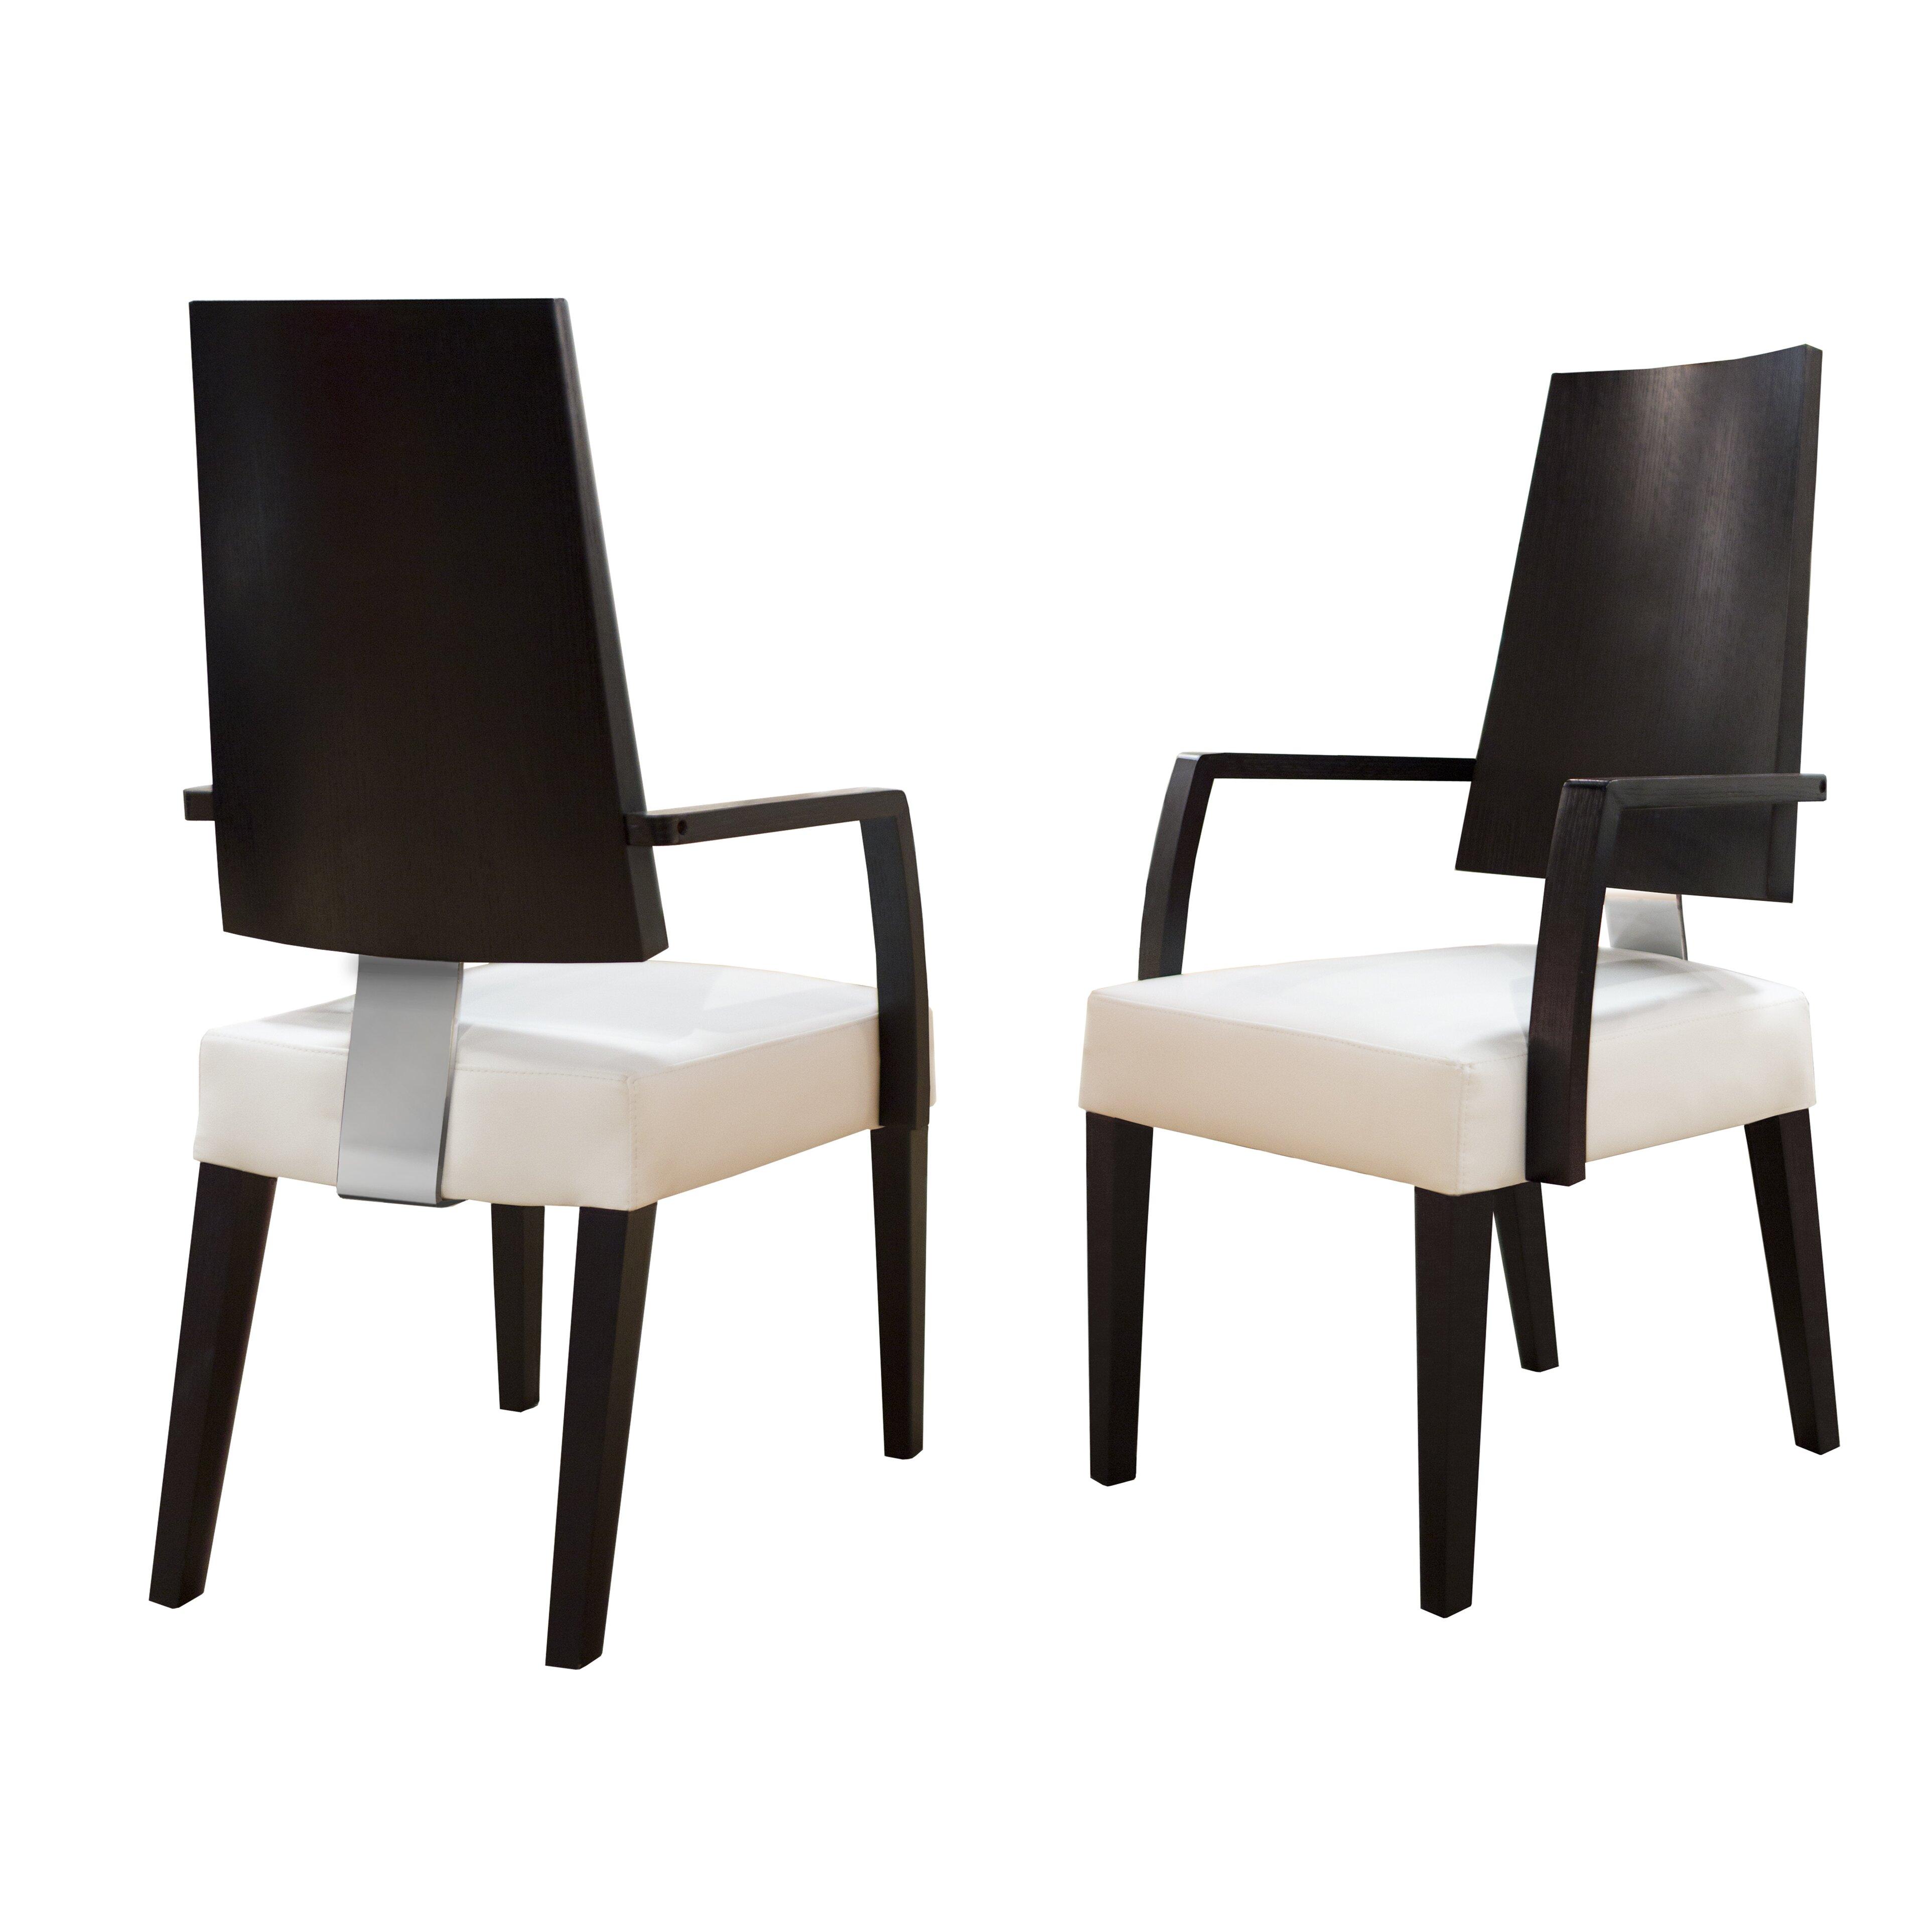 sharelle furniture - sharelle furnishings rocco arm chair reviews wayfair